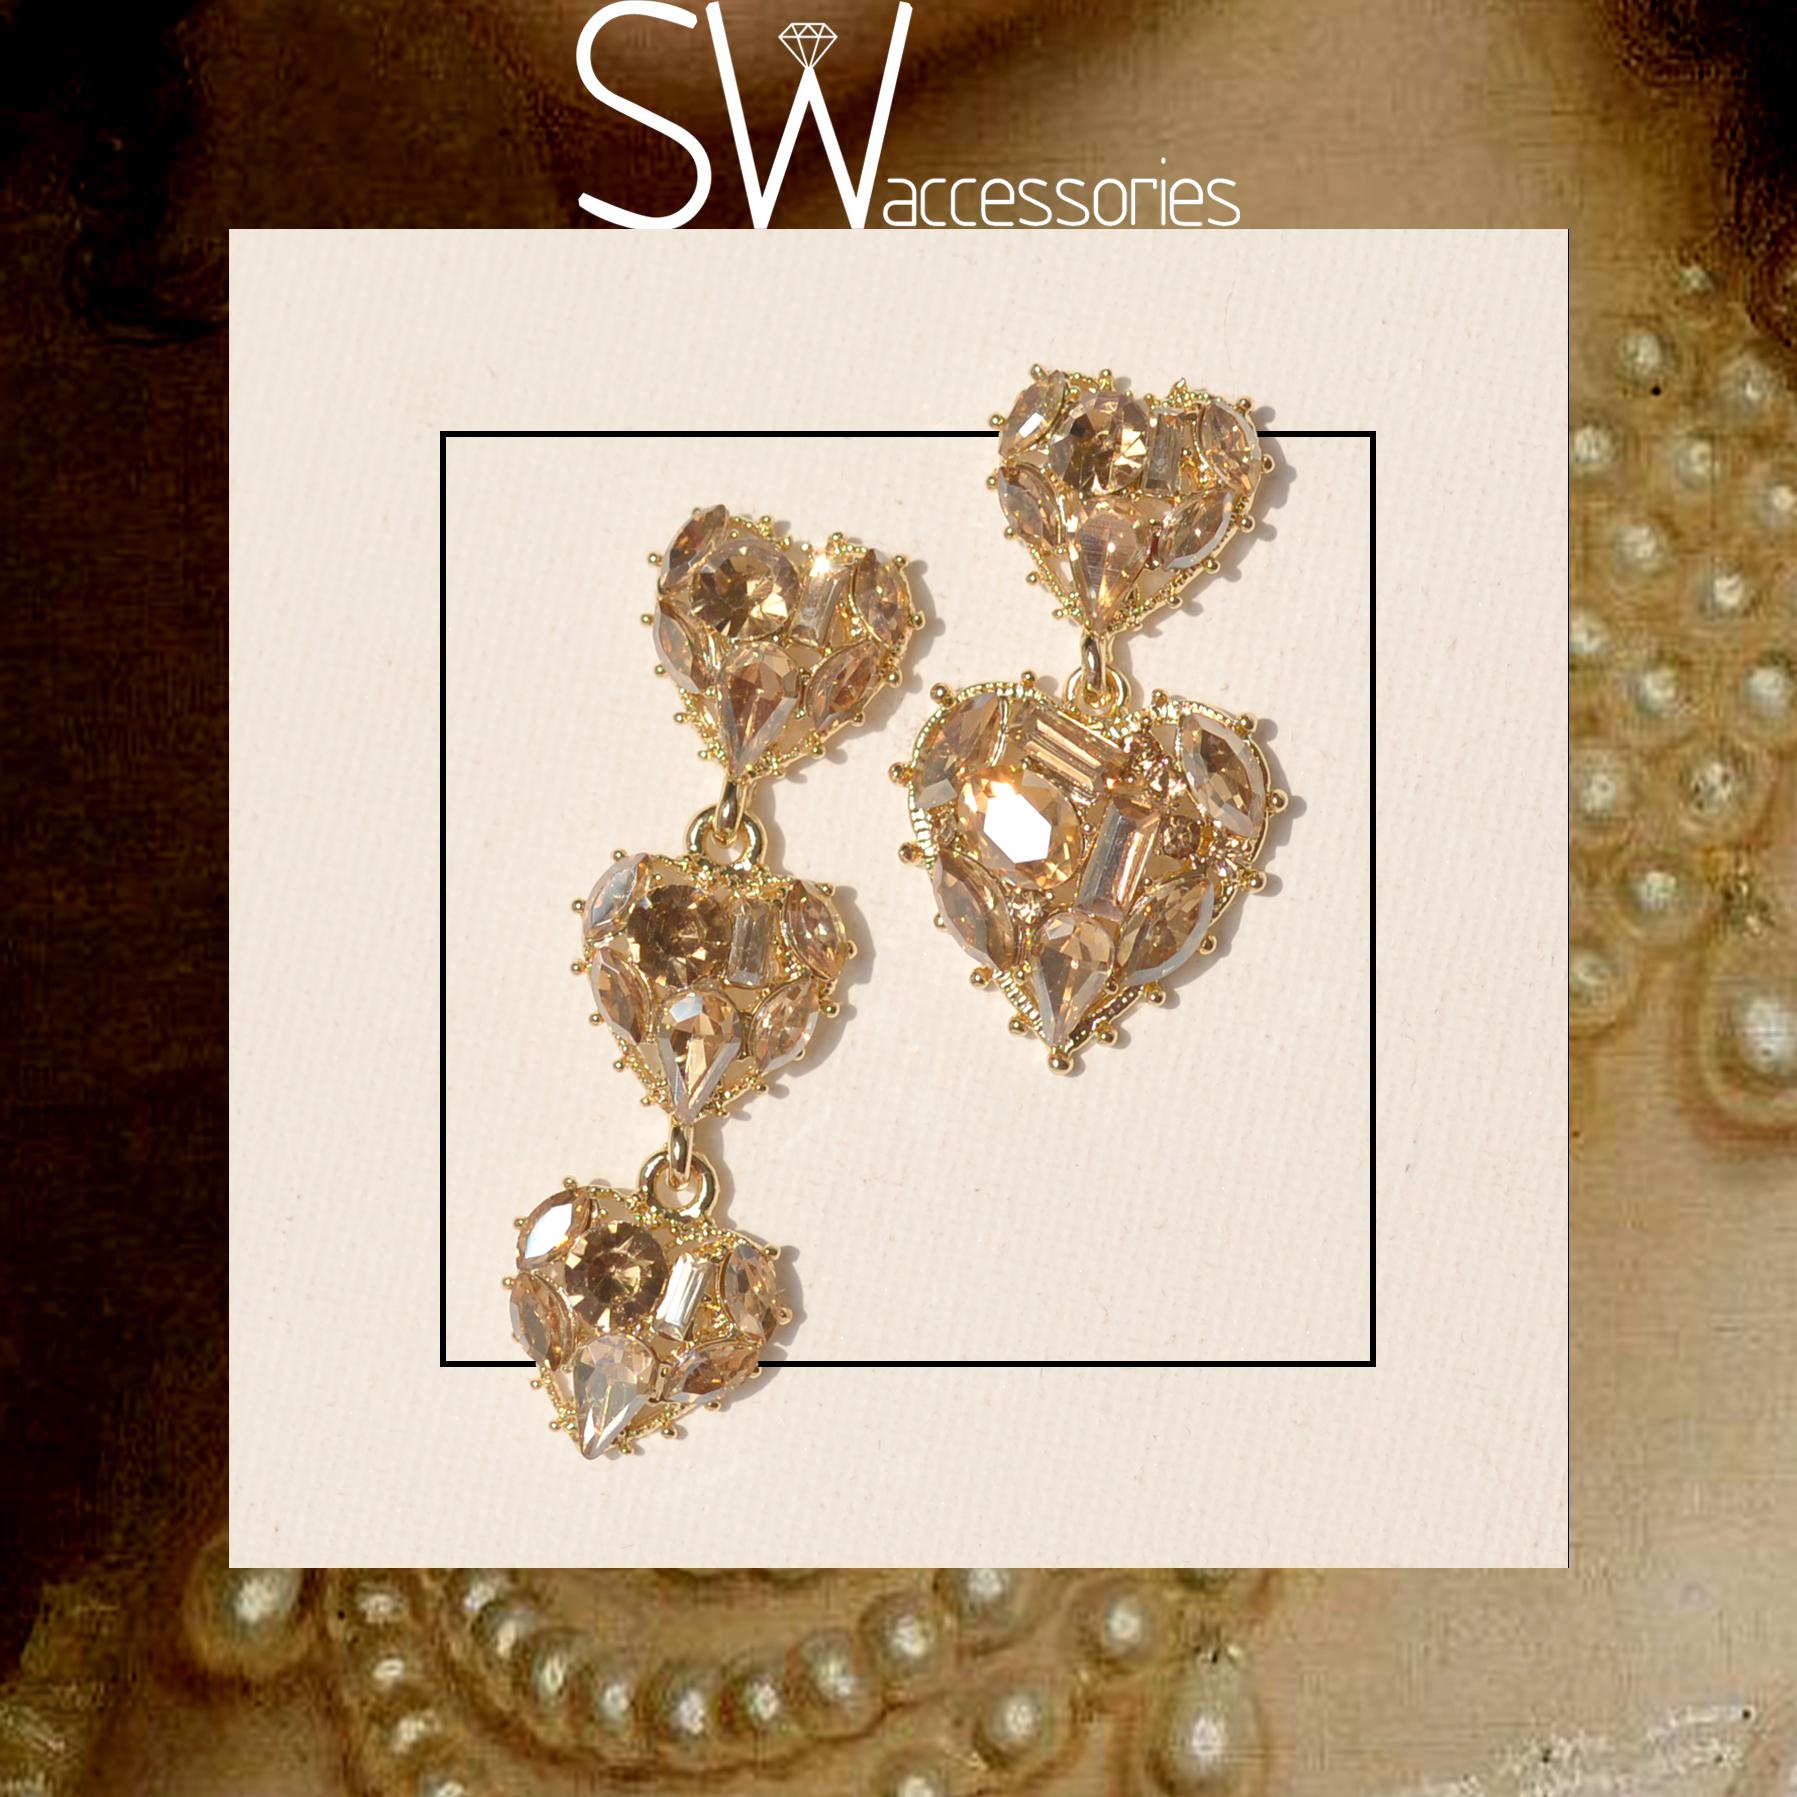 SW/澄糖之心切割宝石元素爱心不对称925银耳钉香槟碎钻女团风耳饰